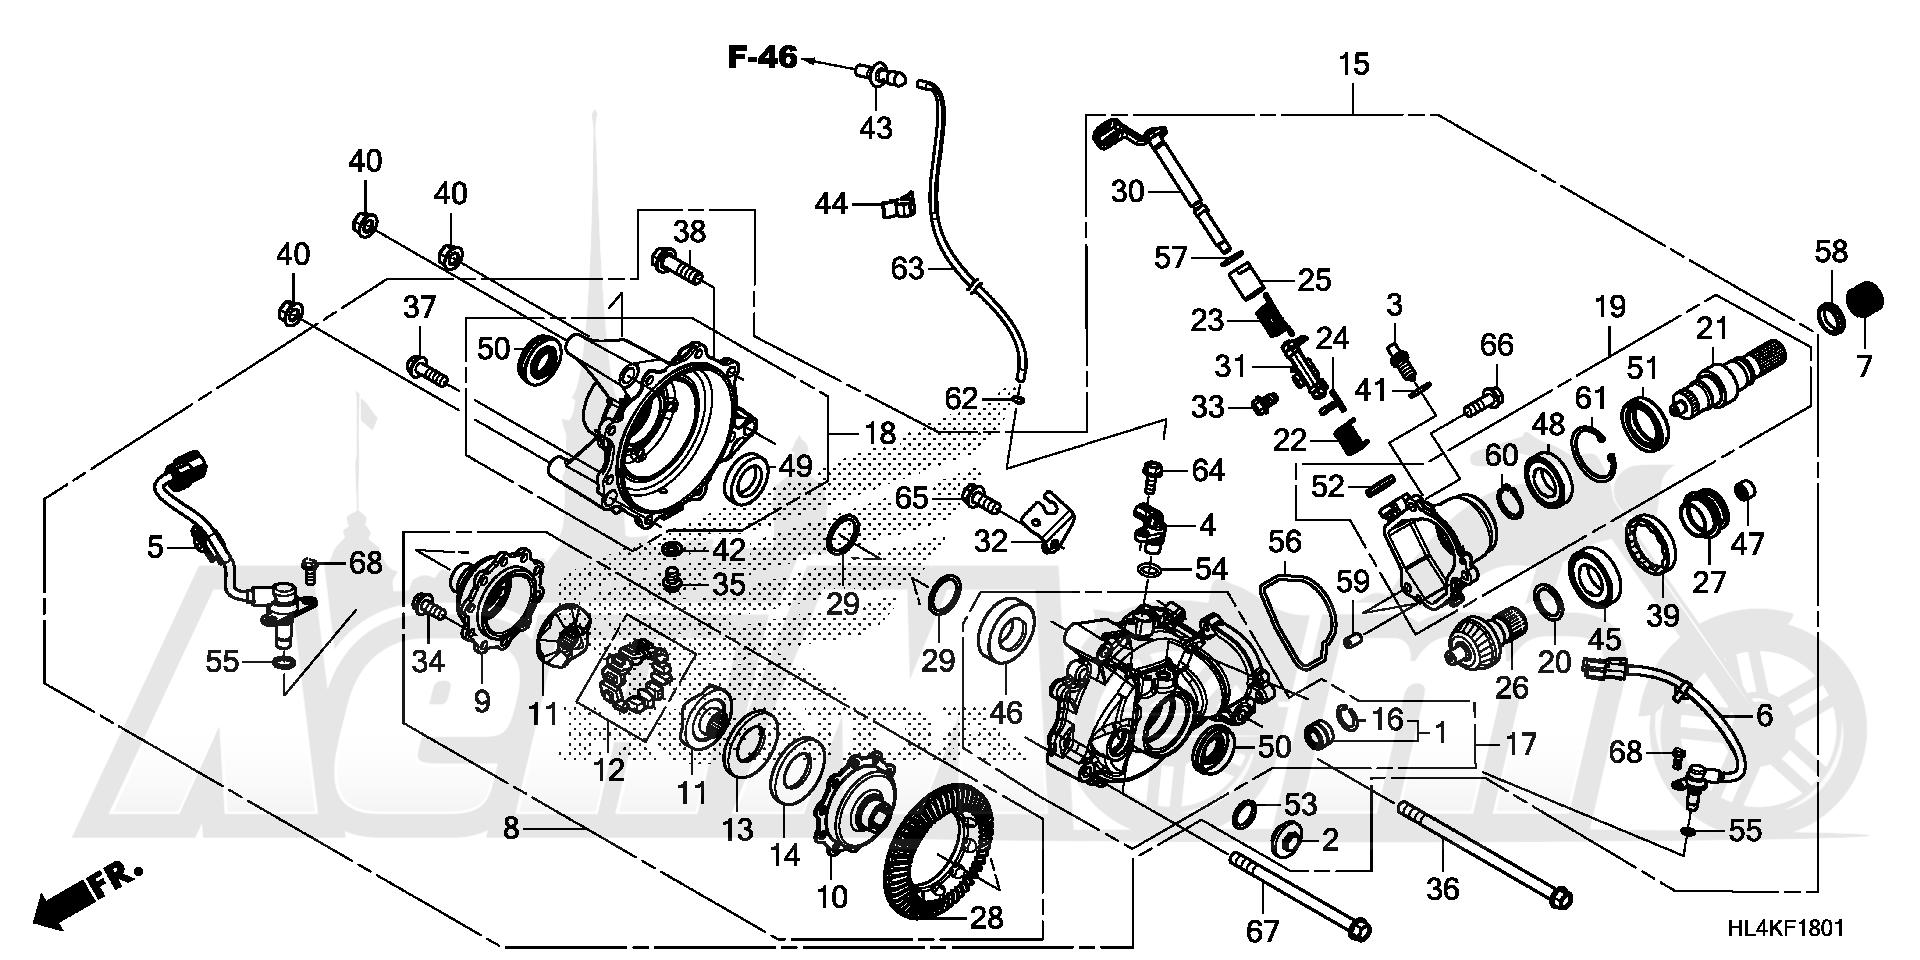 Запчасти для Квадроцикла Honda 2019 SXS1000M5D Раздел: FRONT FINAL GEAR (2) | перед FINAL шестерня (2)